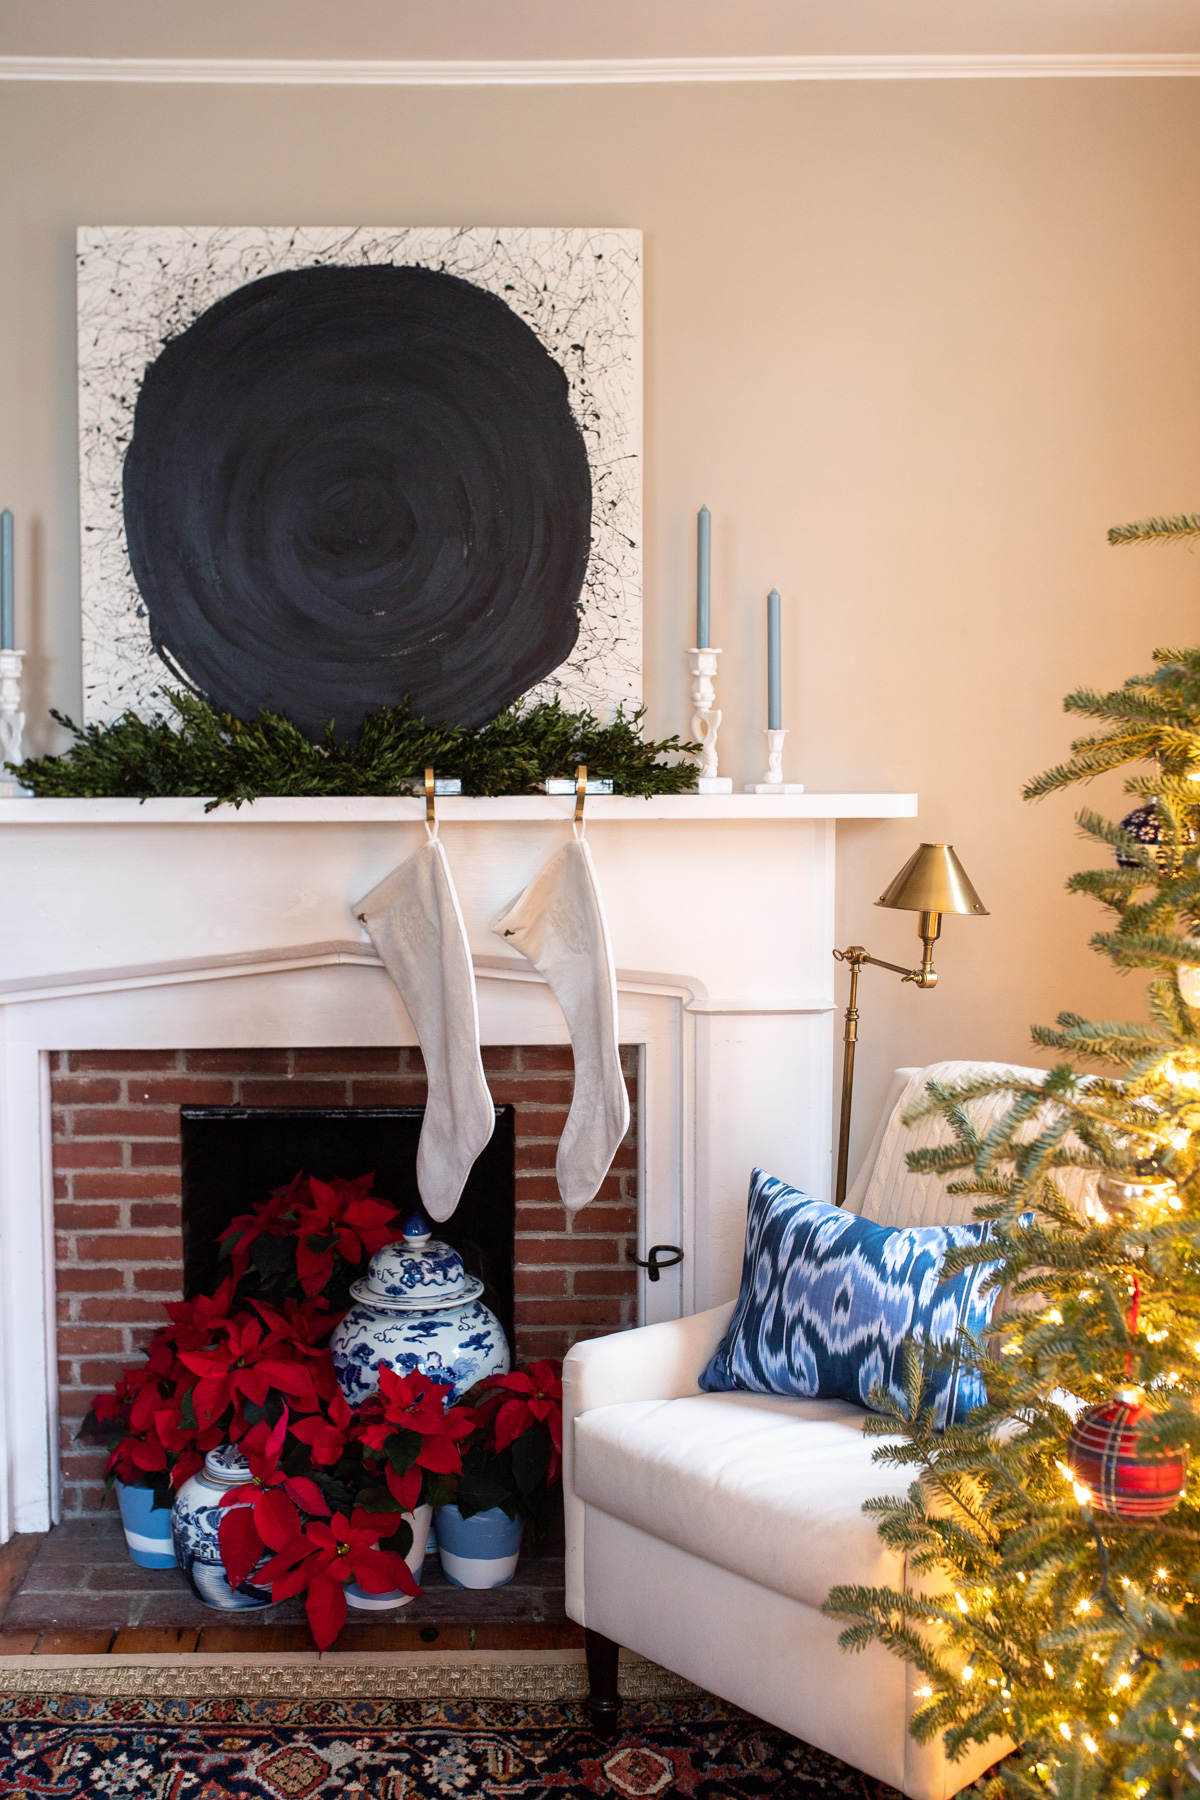 Stacie Flinner x New England Holiday Decorations-10.jpg